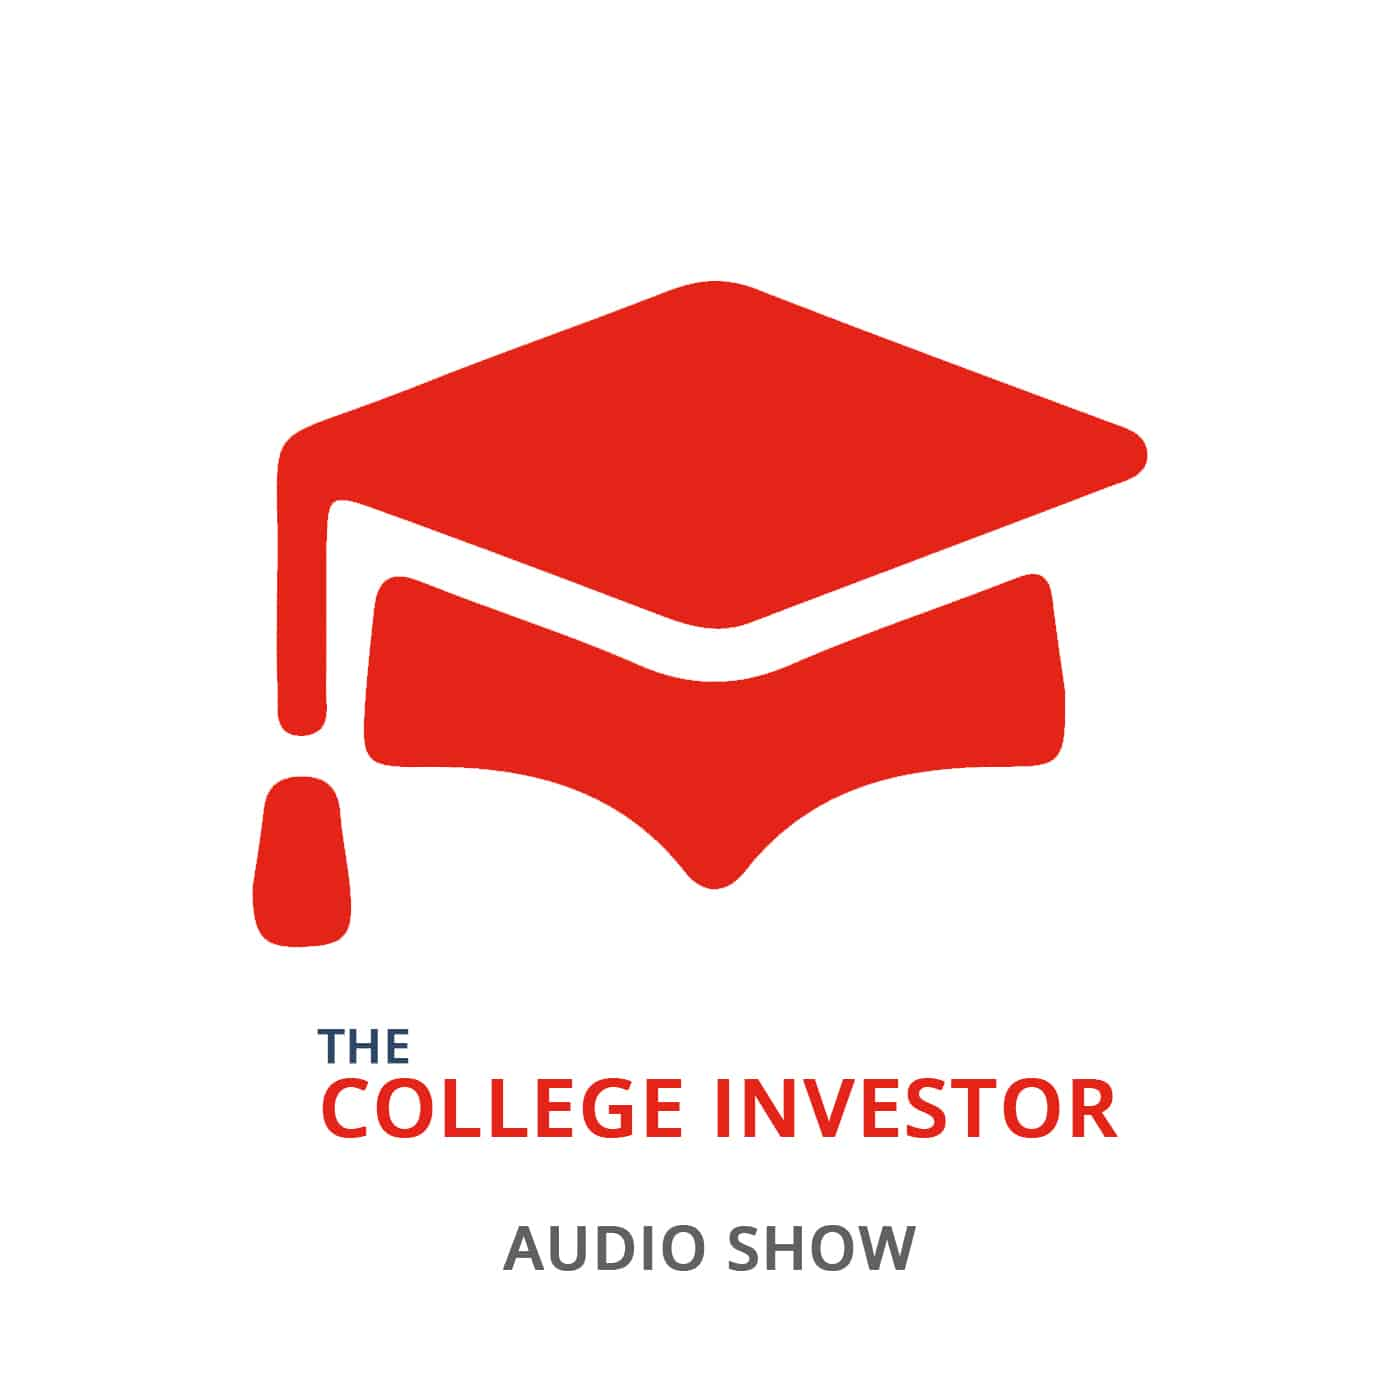 The College Investor Audio Show | Investing | Student Loan Debt | Entrepreneurship